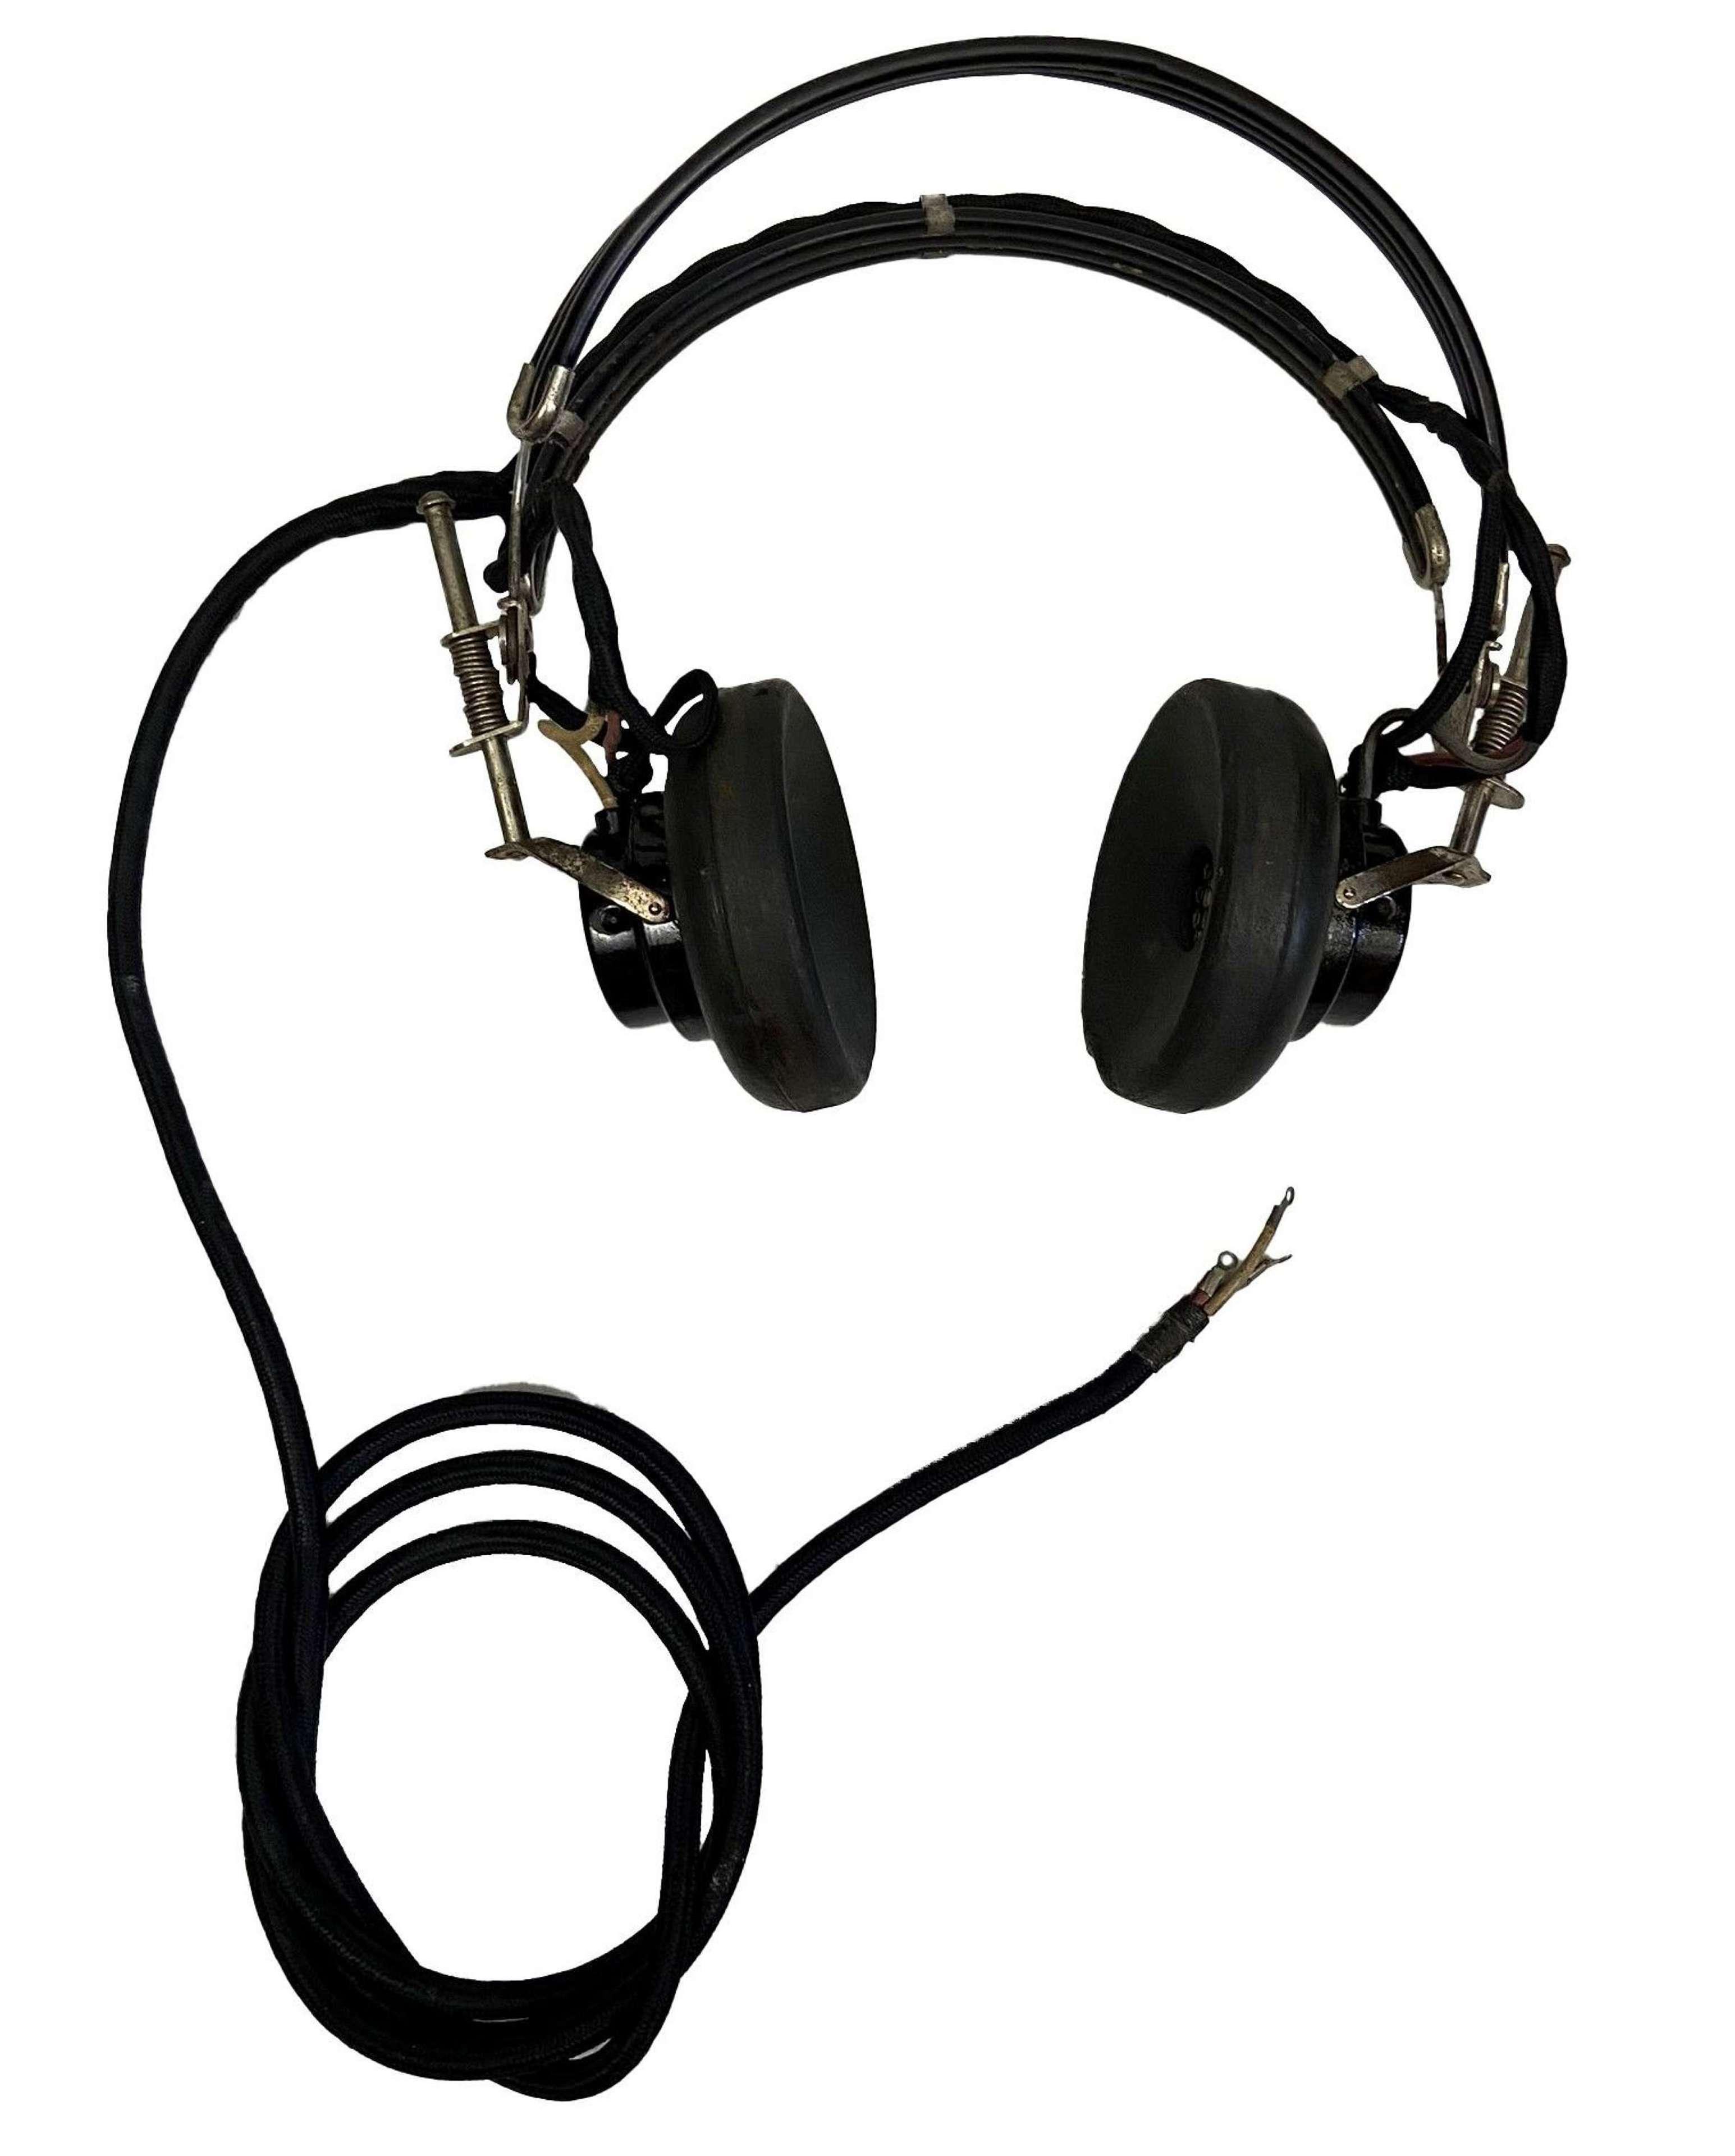 Post WW2 US Made Radio Headset